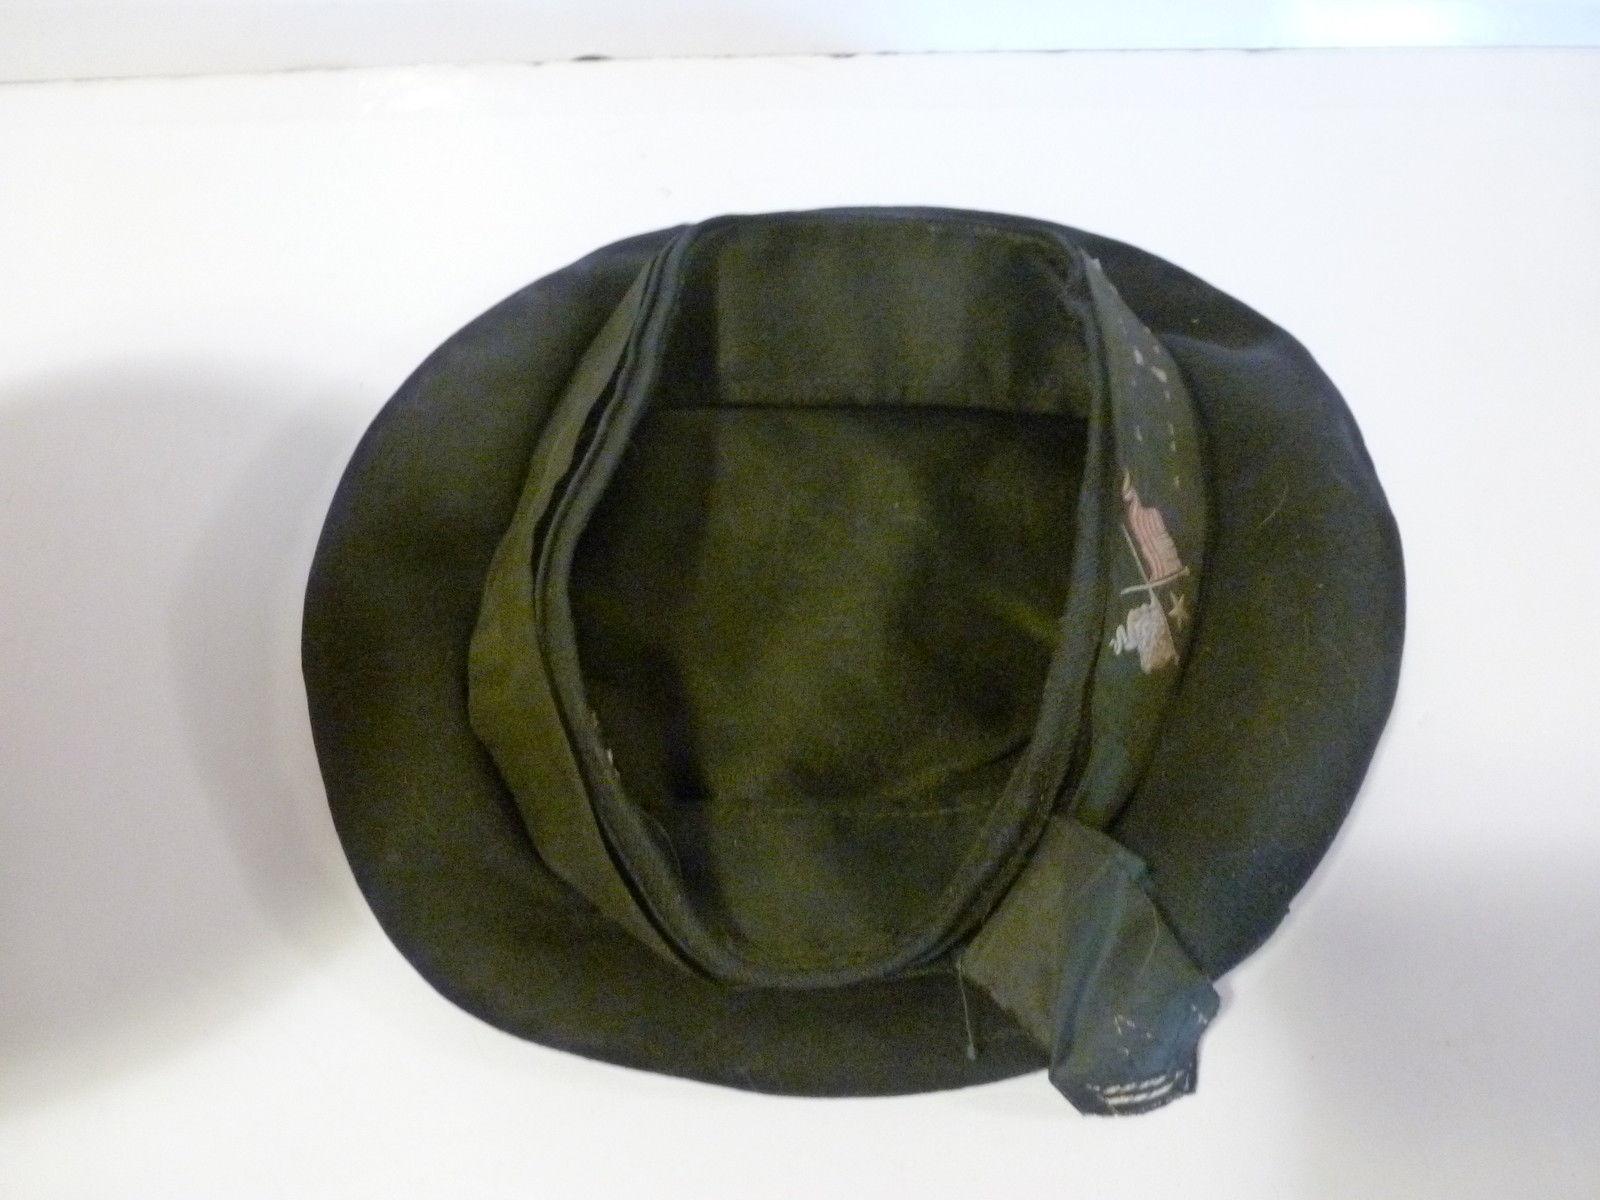 93ca54cfb22 U.s. Navy flat hats pre ww2 - Page 6